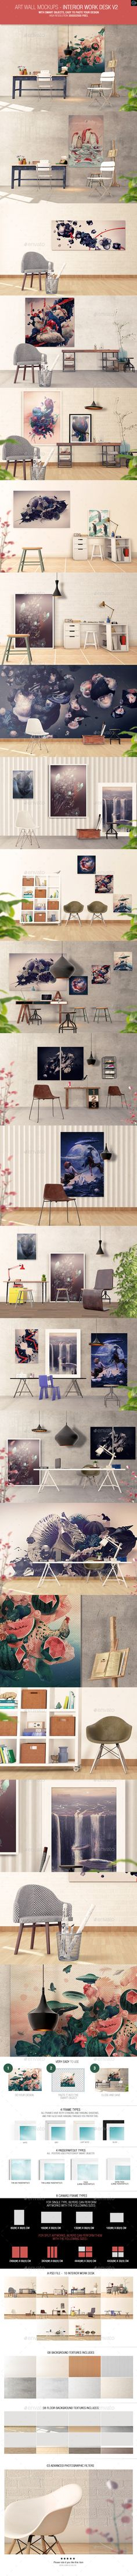 Art Wall Mockups - Interior Work Desk V2 - Miscellaneous Displays